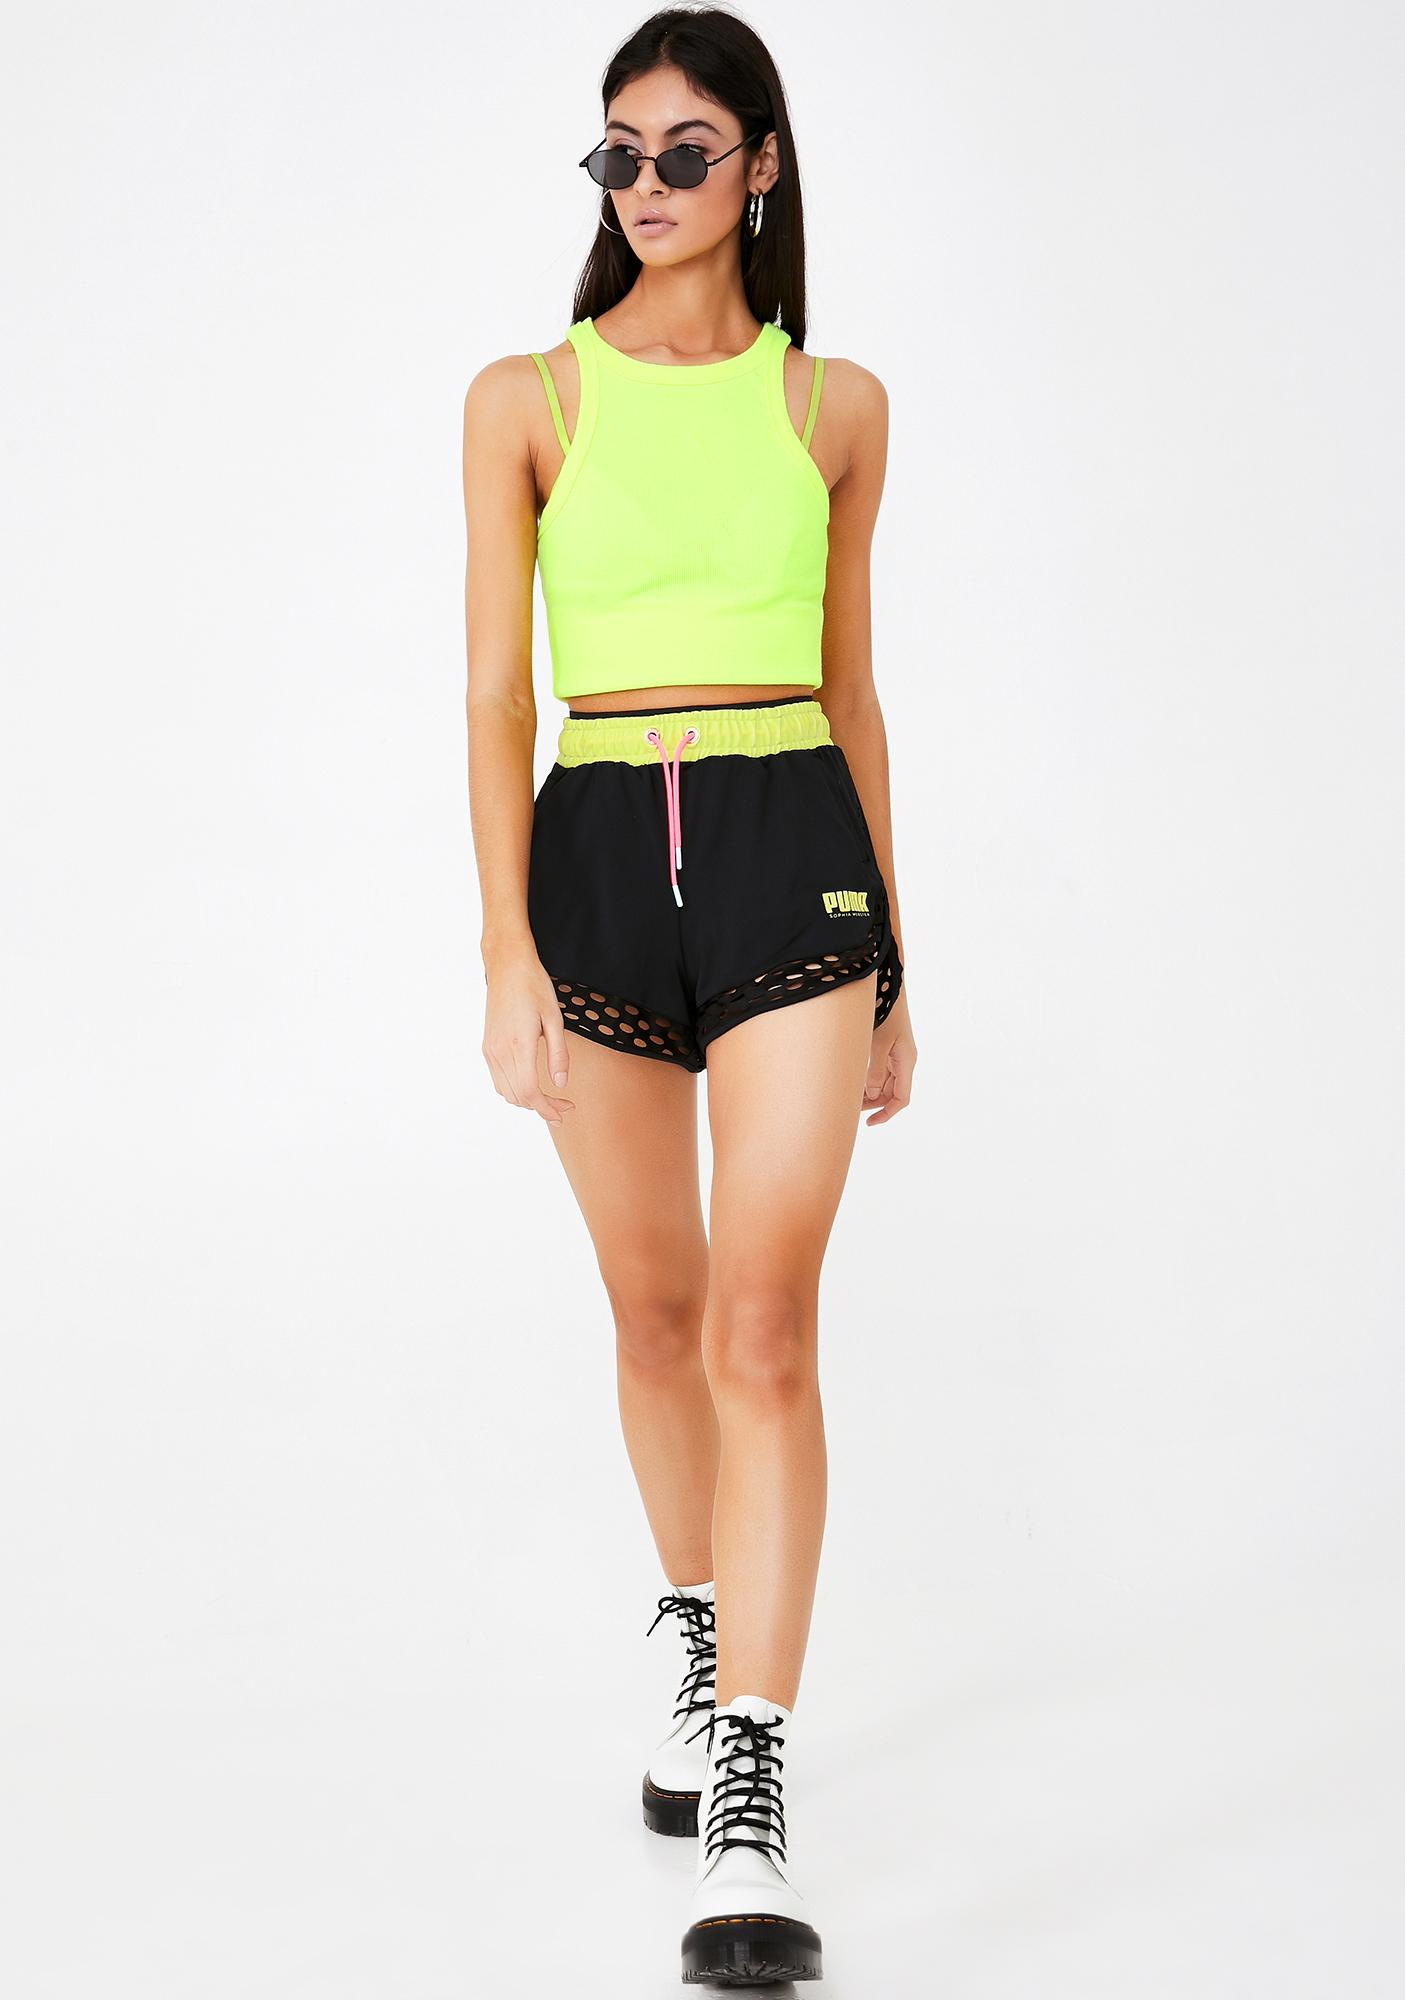 PUMA Dark X Sophia Webster Shorts